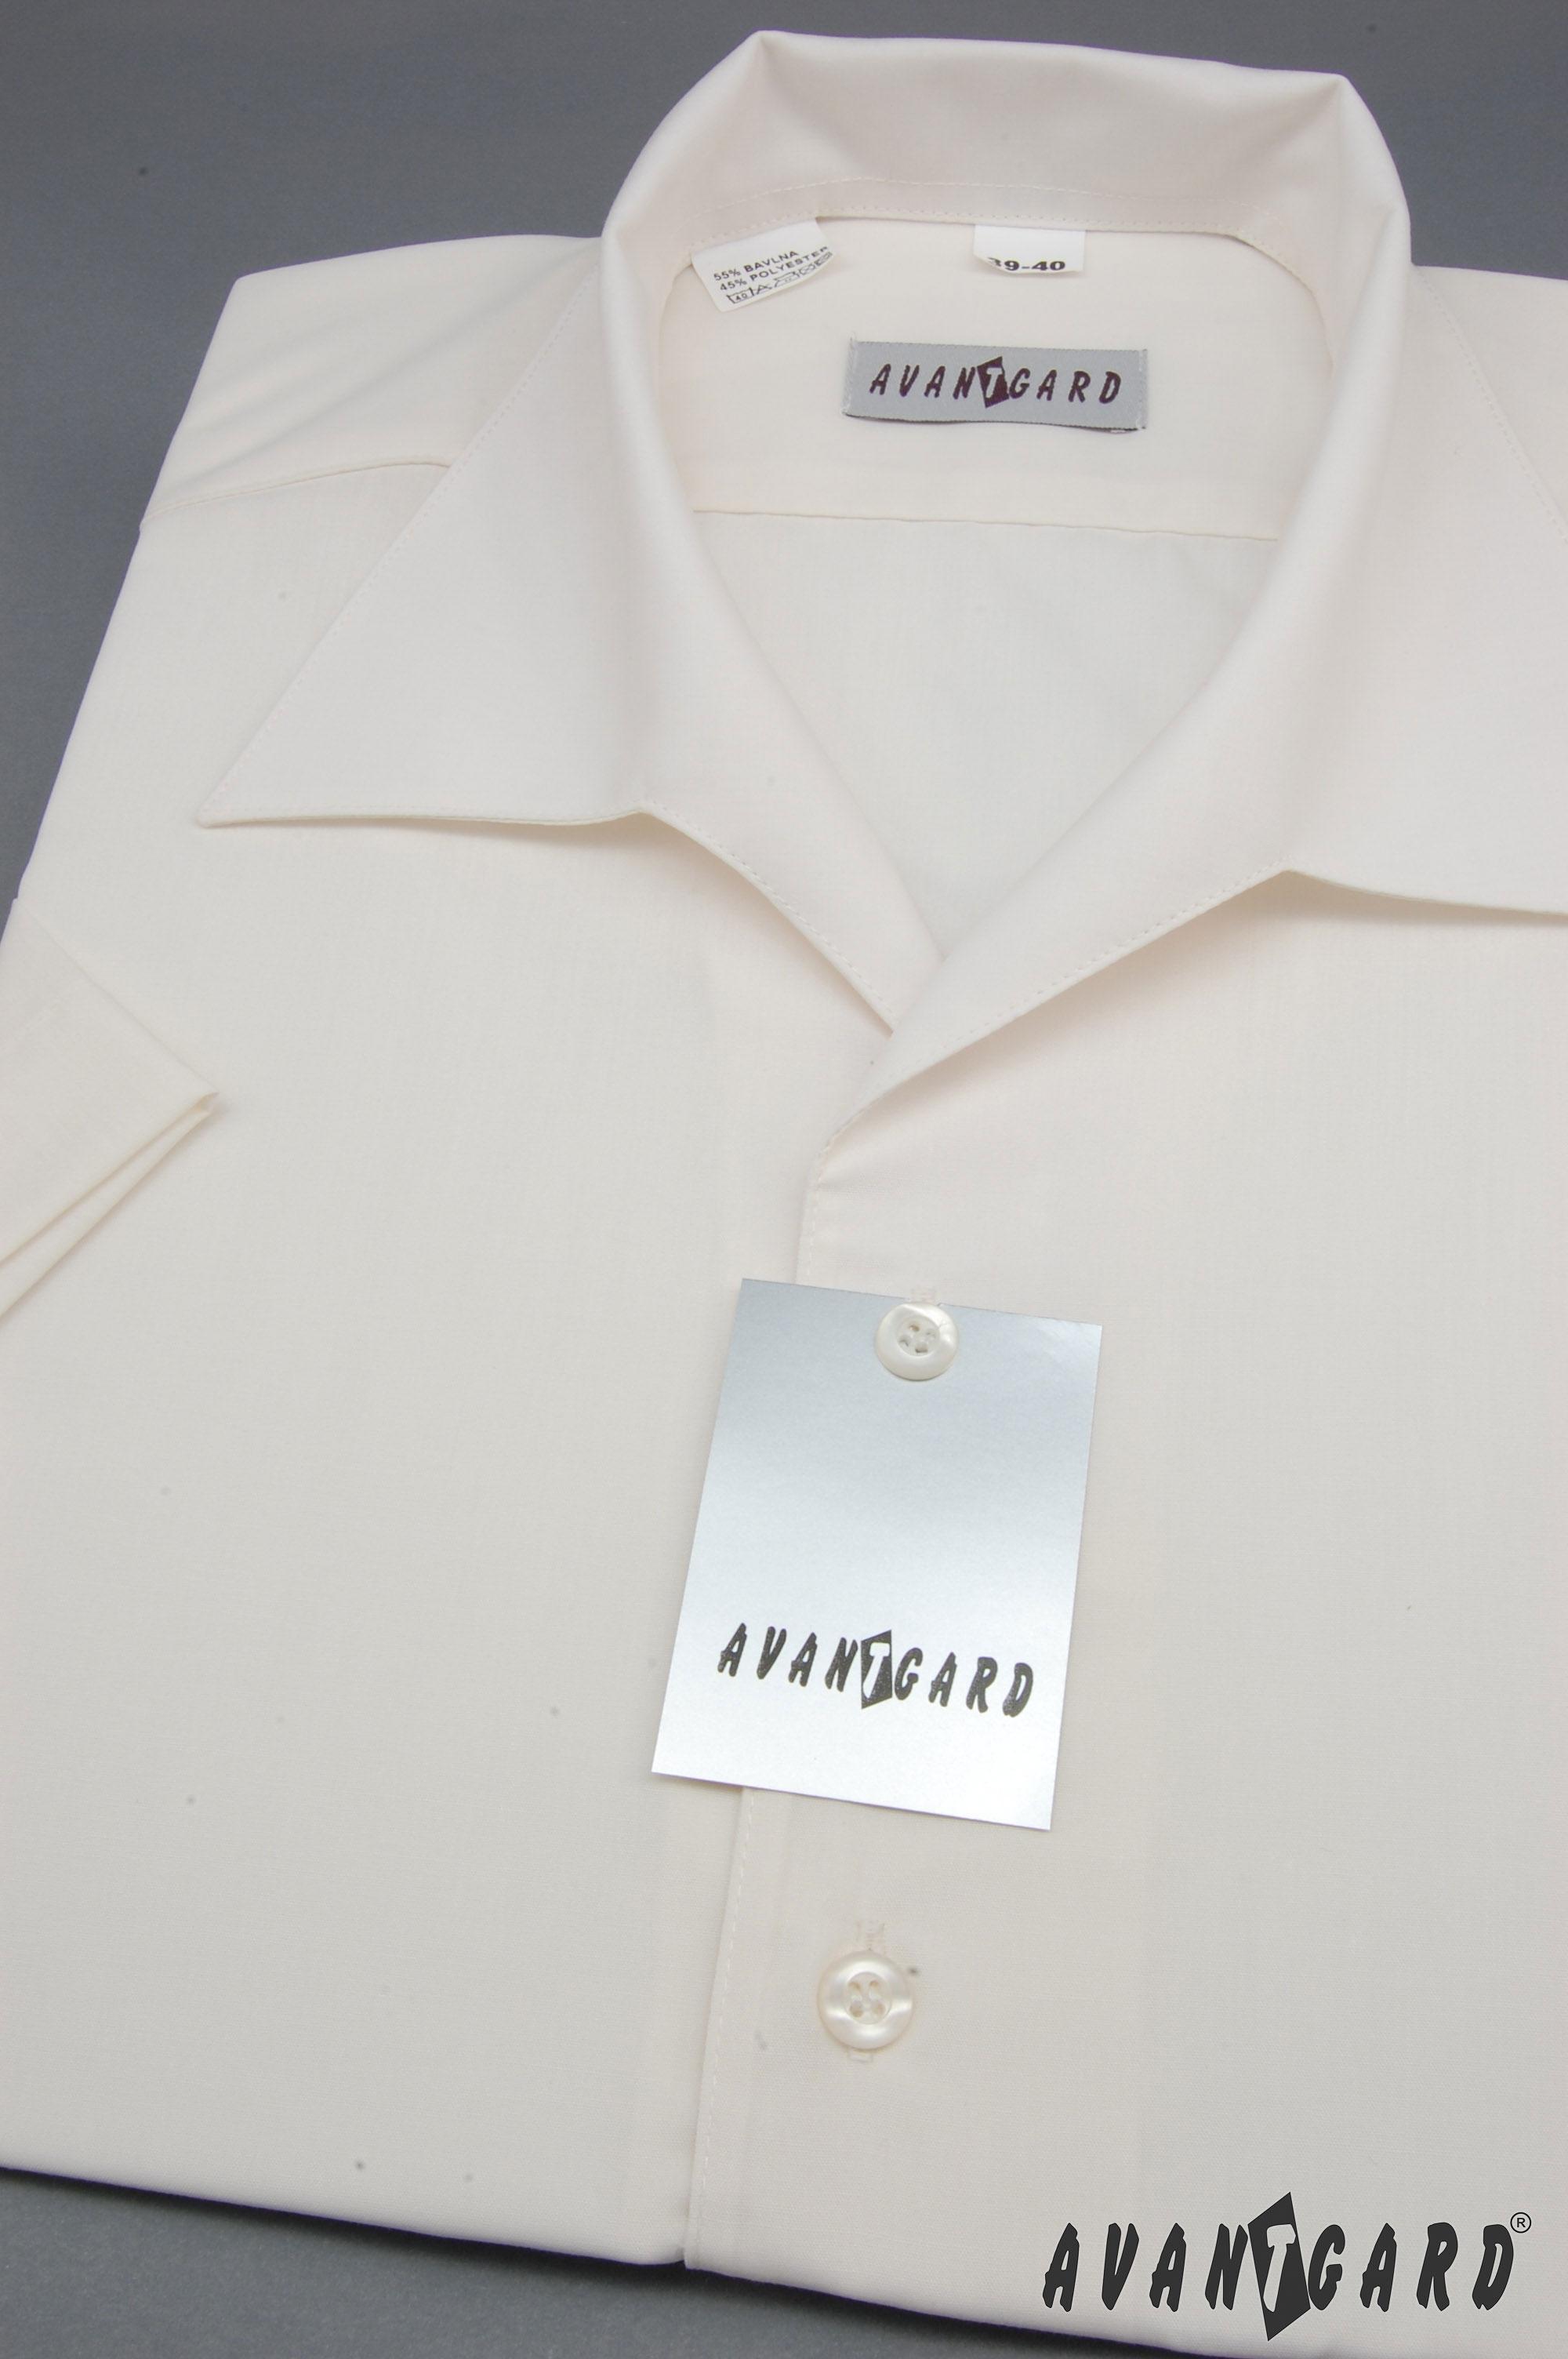 Avantgard pánská košile rozhalenka krátký rukáv 456-2 barva smetanová 4496400299